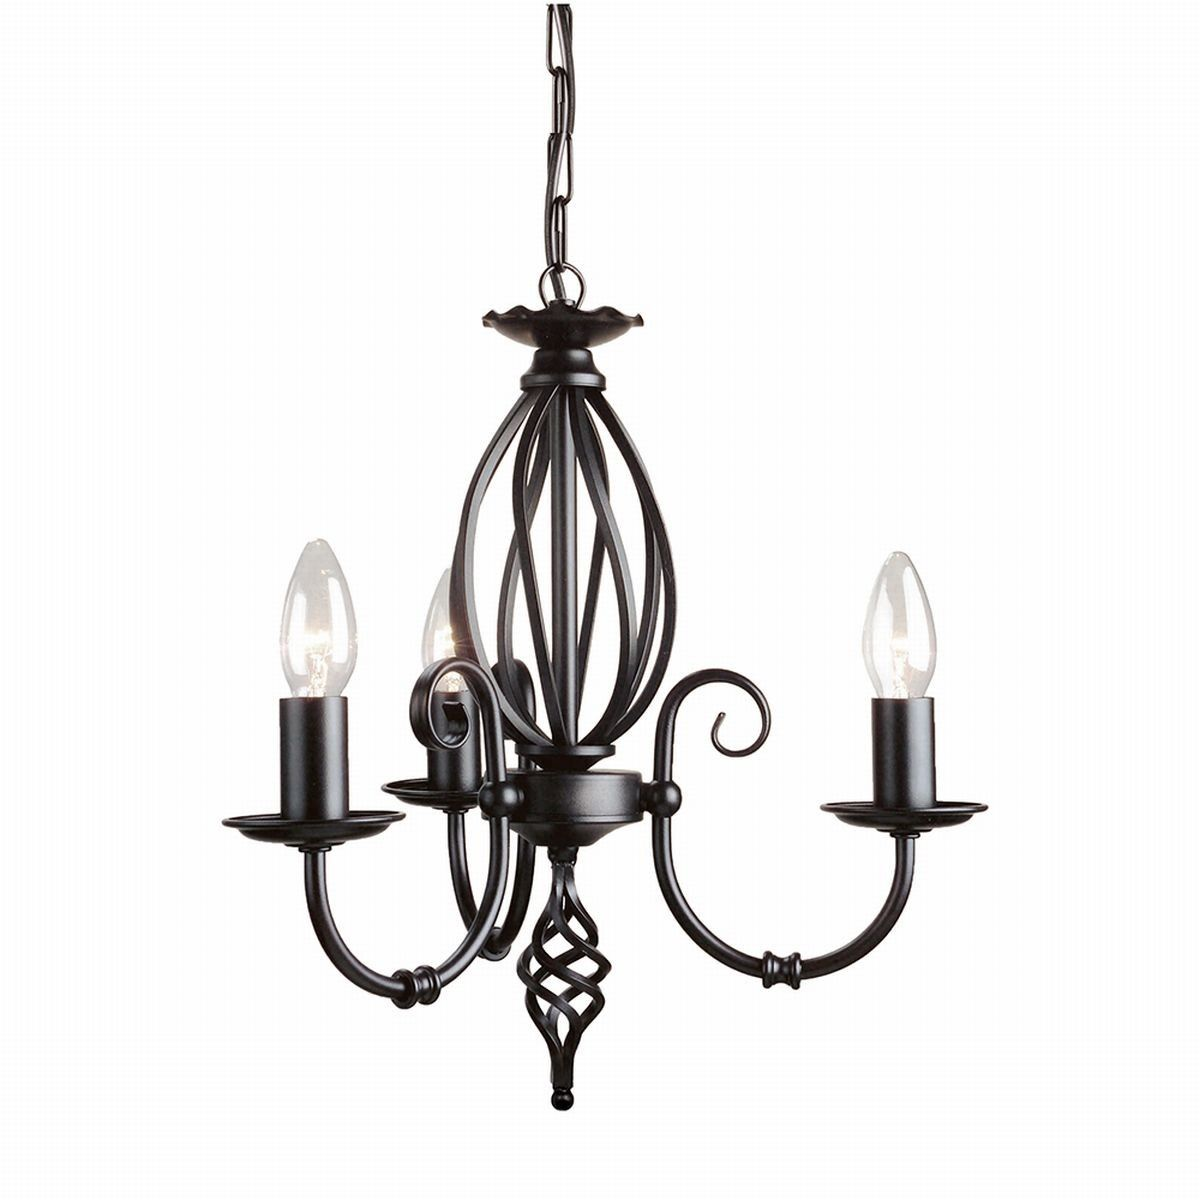 Artisan Light Black - Elstead Lighting - lampa wisząca klasyczna